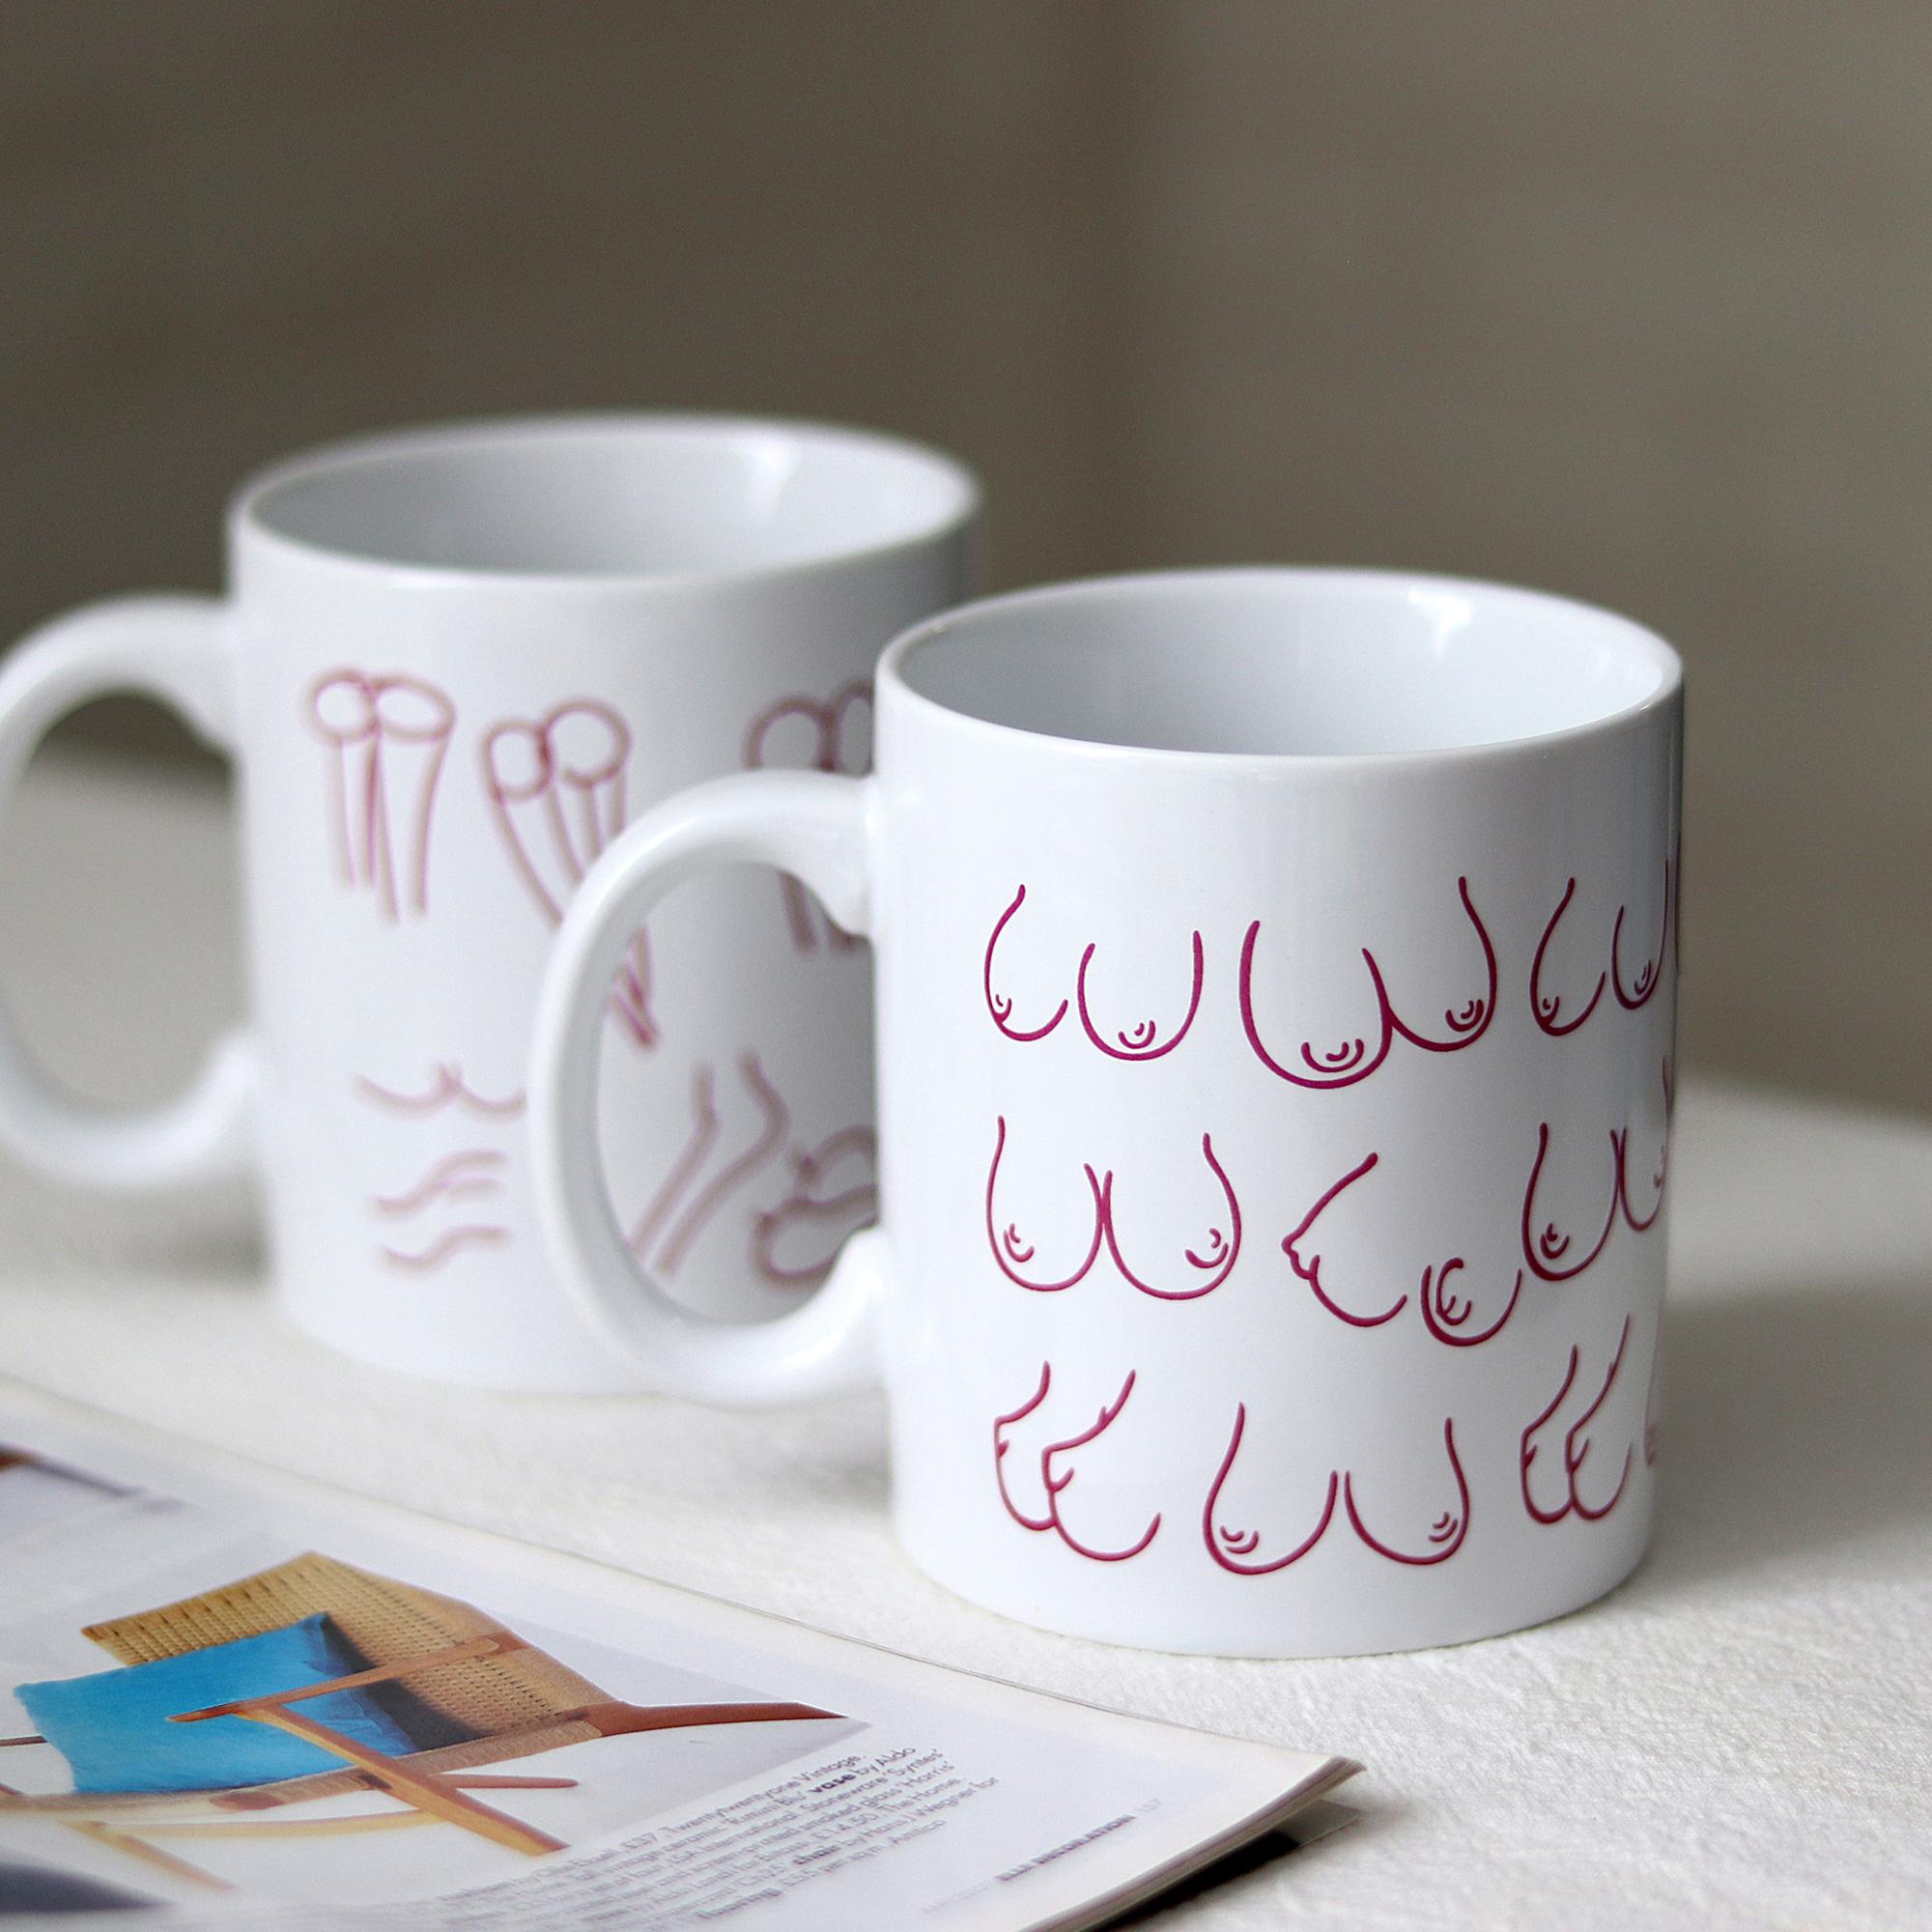 Matching Couple Coffee Mugs Wedding Gifts For Guests Buy Coffee Mugs Wedding Gifts Wedding Gifts For Guests Matching Couple Mugs Product On Alibaba Com